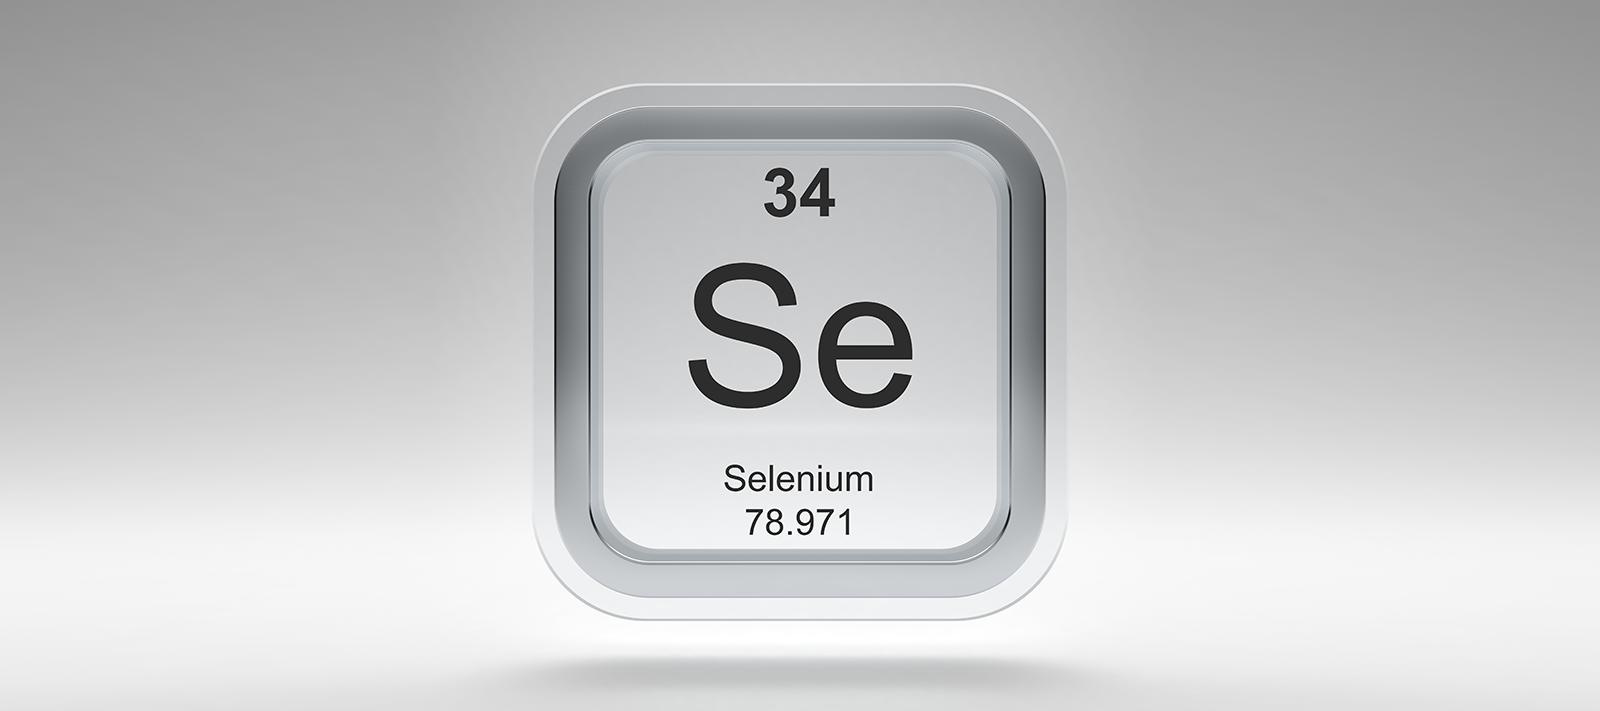 Selenium, Selenoid, Selenide, Selendroid… Что все это значит?